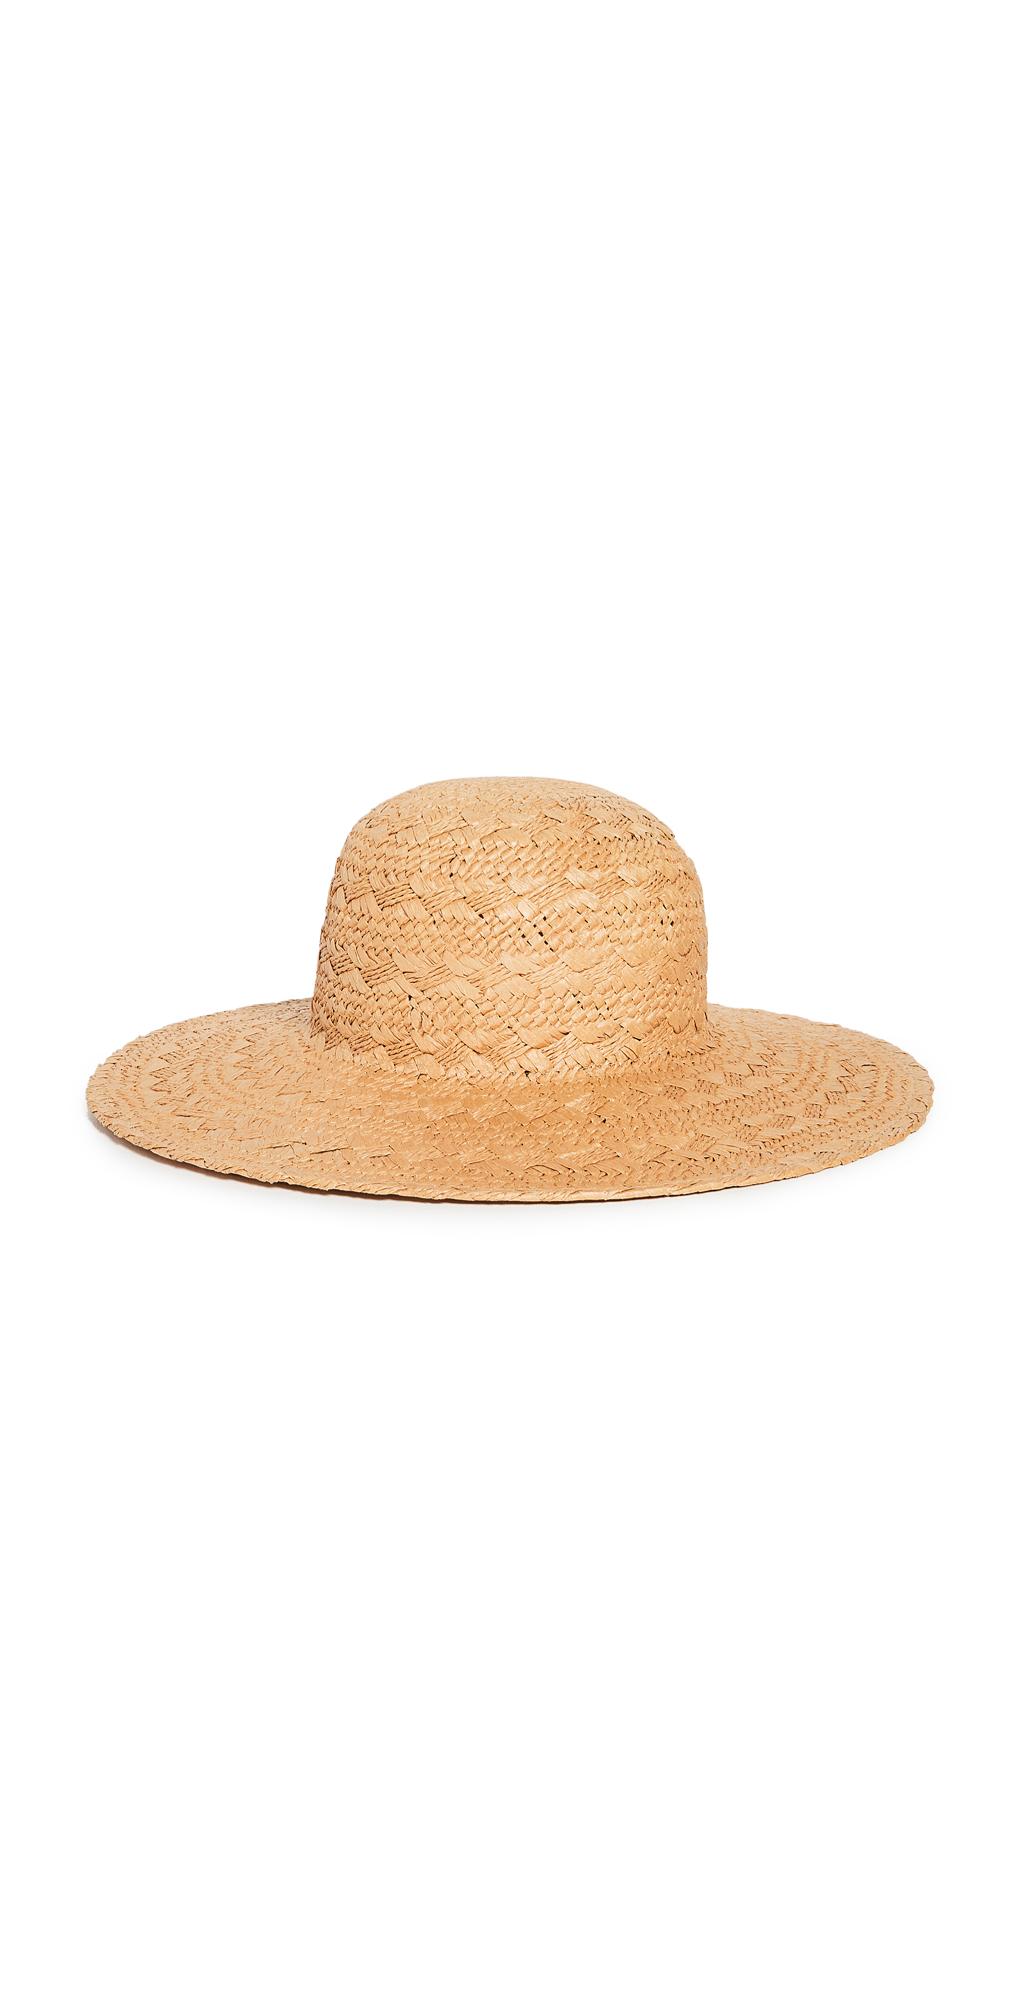 Madewell Multi Weave Straw Hat